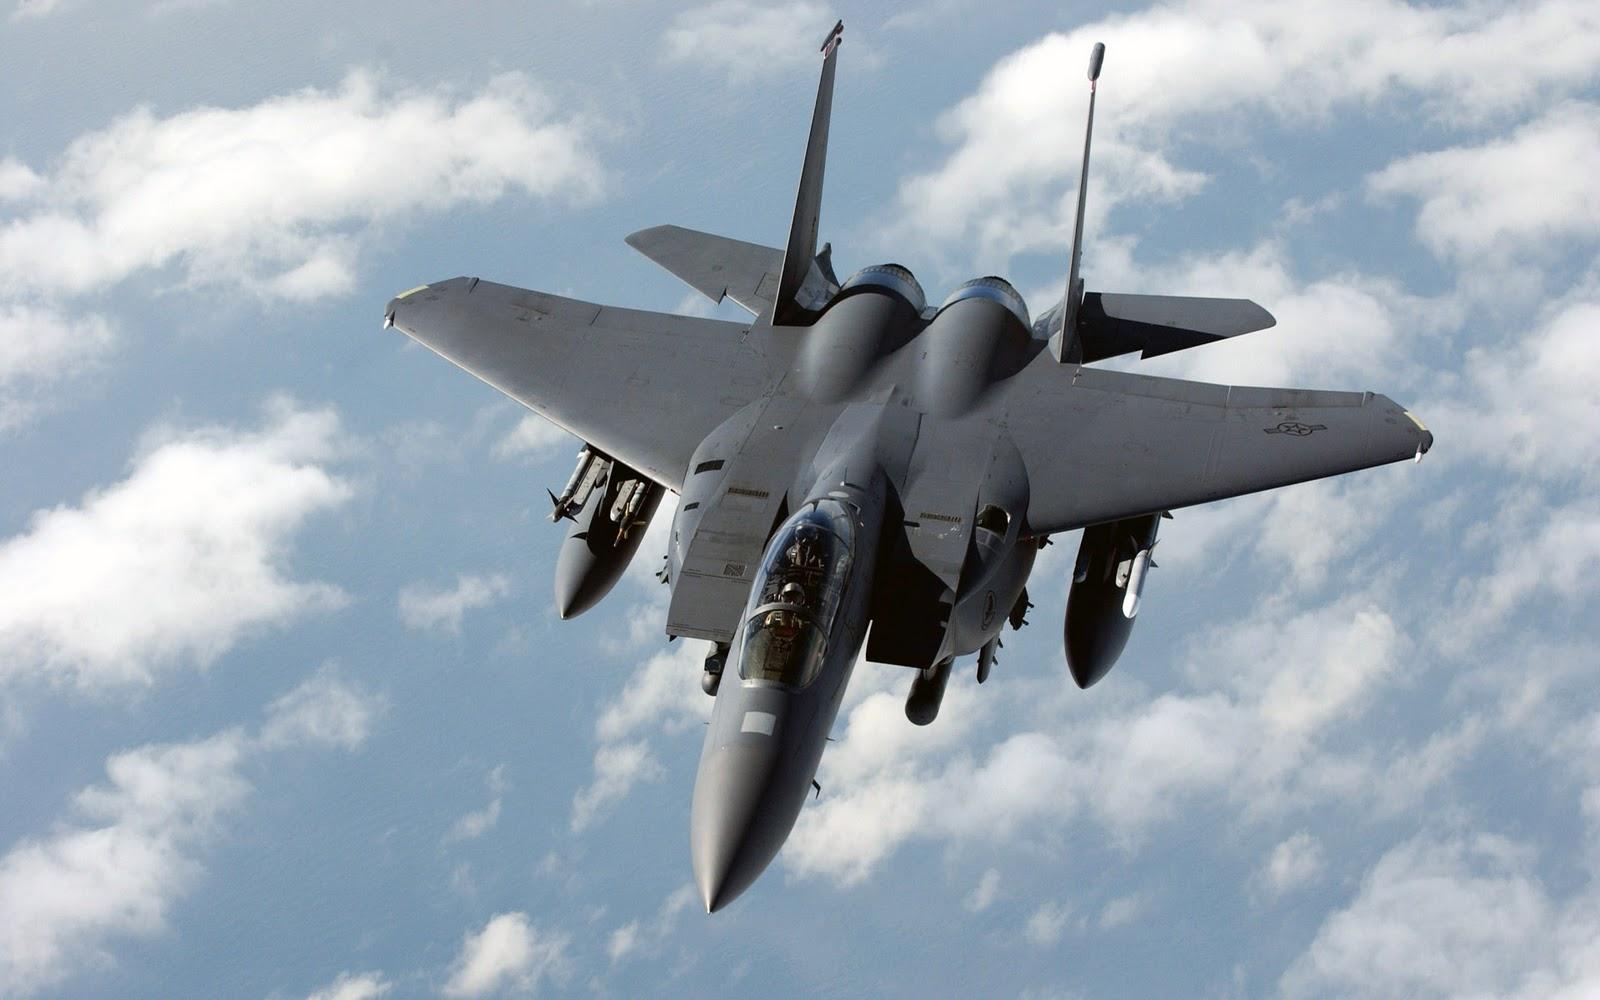 http://2.bp.blogspot.com/_KtoUah5Q8Zc/TOA-kM8-1MI/AAAAAAAAAEg/zFFZLboQwC0/s1600/f_15e_strike_eagle_dual_role_fighter-wide.jpg